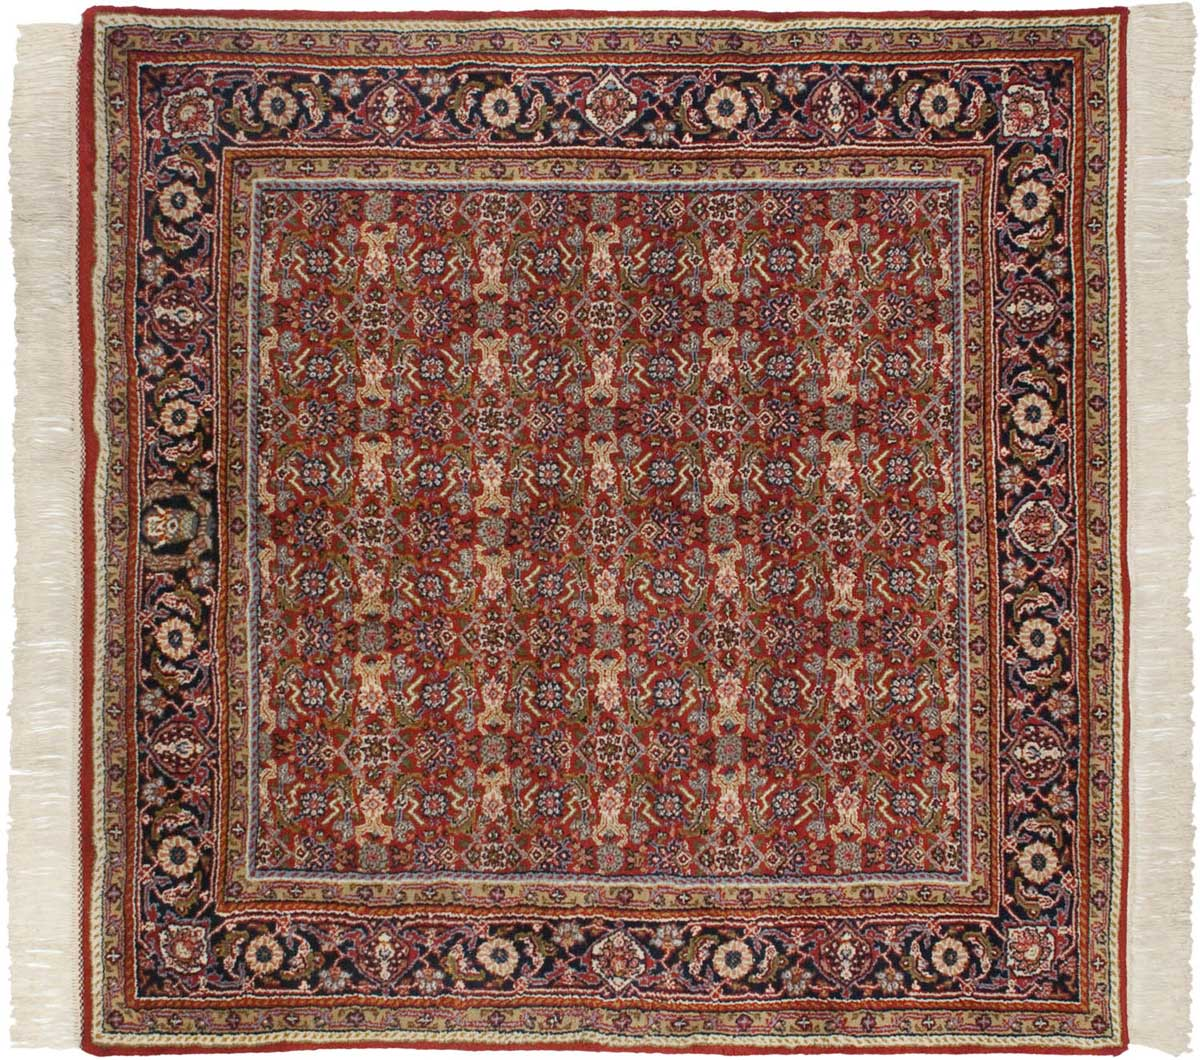 5 215 5 Tabriz Red Oriental Square Rug 033739 Carpets By